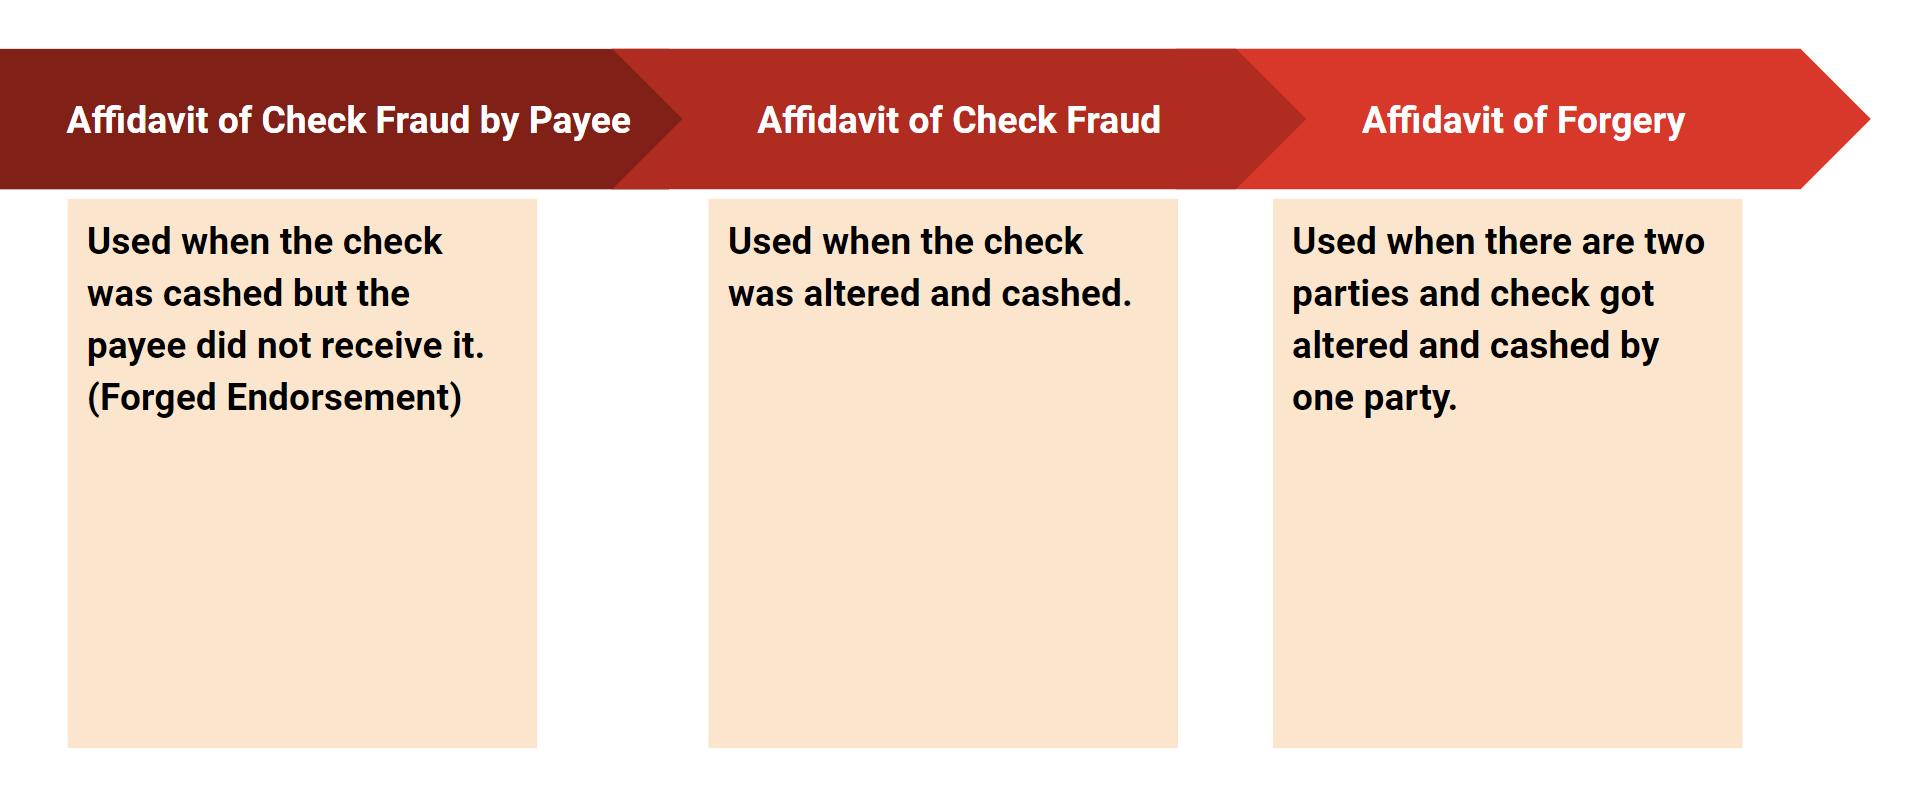 Scenarios that require an immediate affidavit form fill